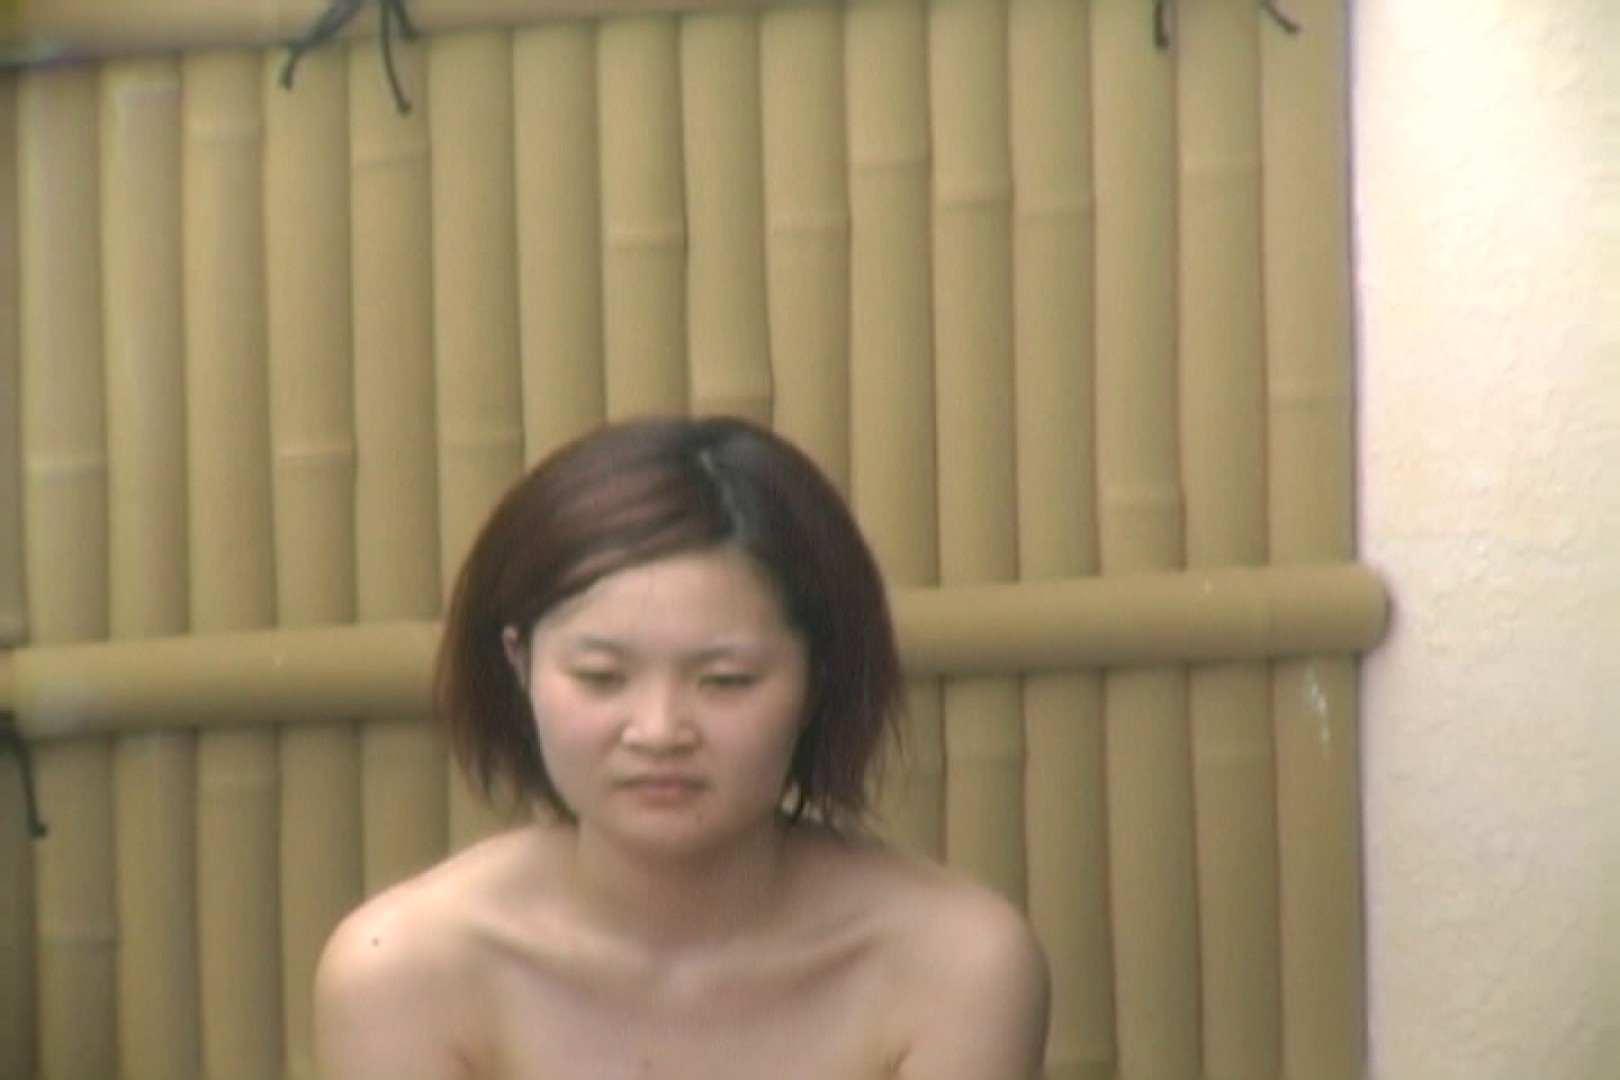 Aquaな露天風呂Vol.11【VIP】 露天風呂  10枚 6